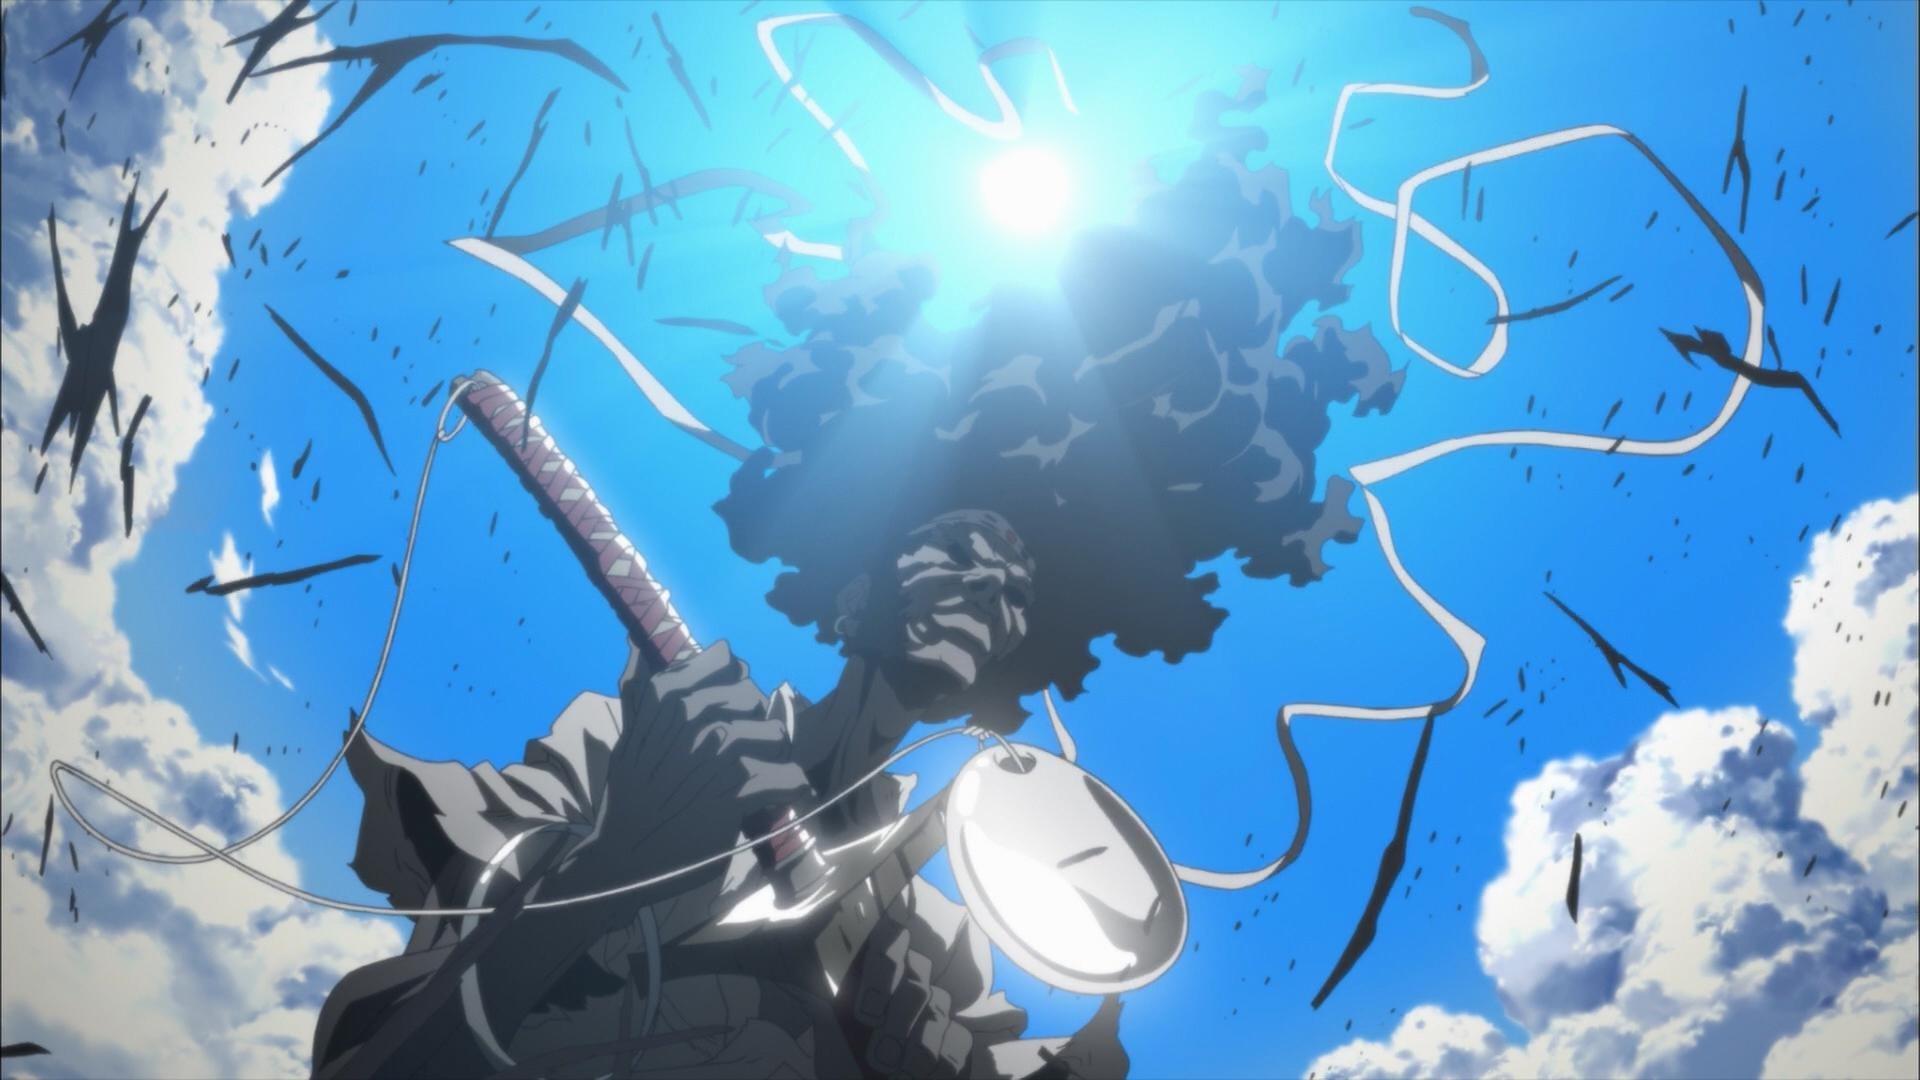 wallpaper.wiki-Free-Download-Afro-Samurai-Wallpaper-PIC-